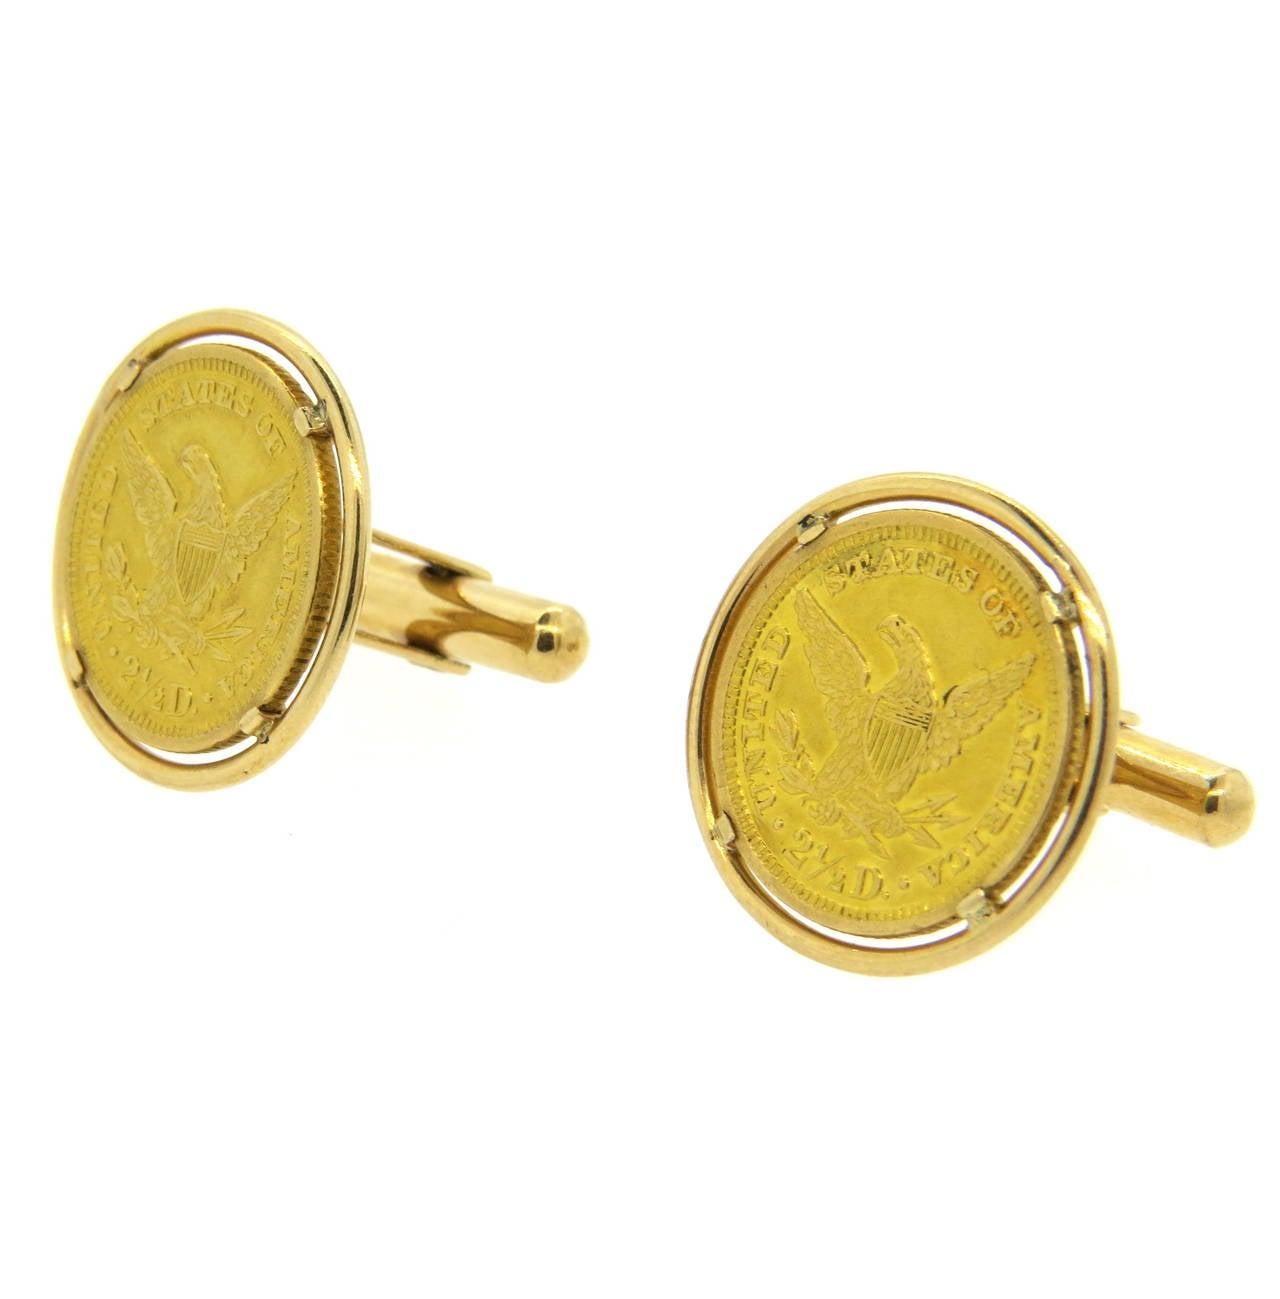 1904 US 2.5 Dollar Gold Coin Cufflinks at 1stdibs